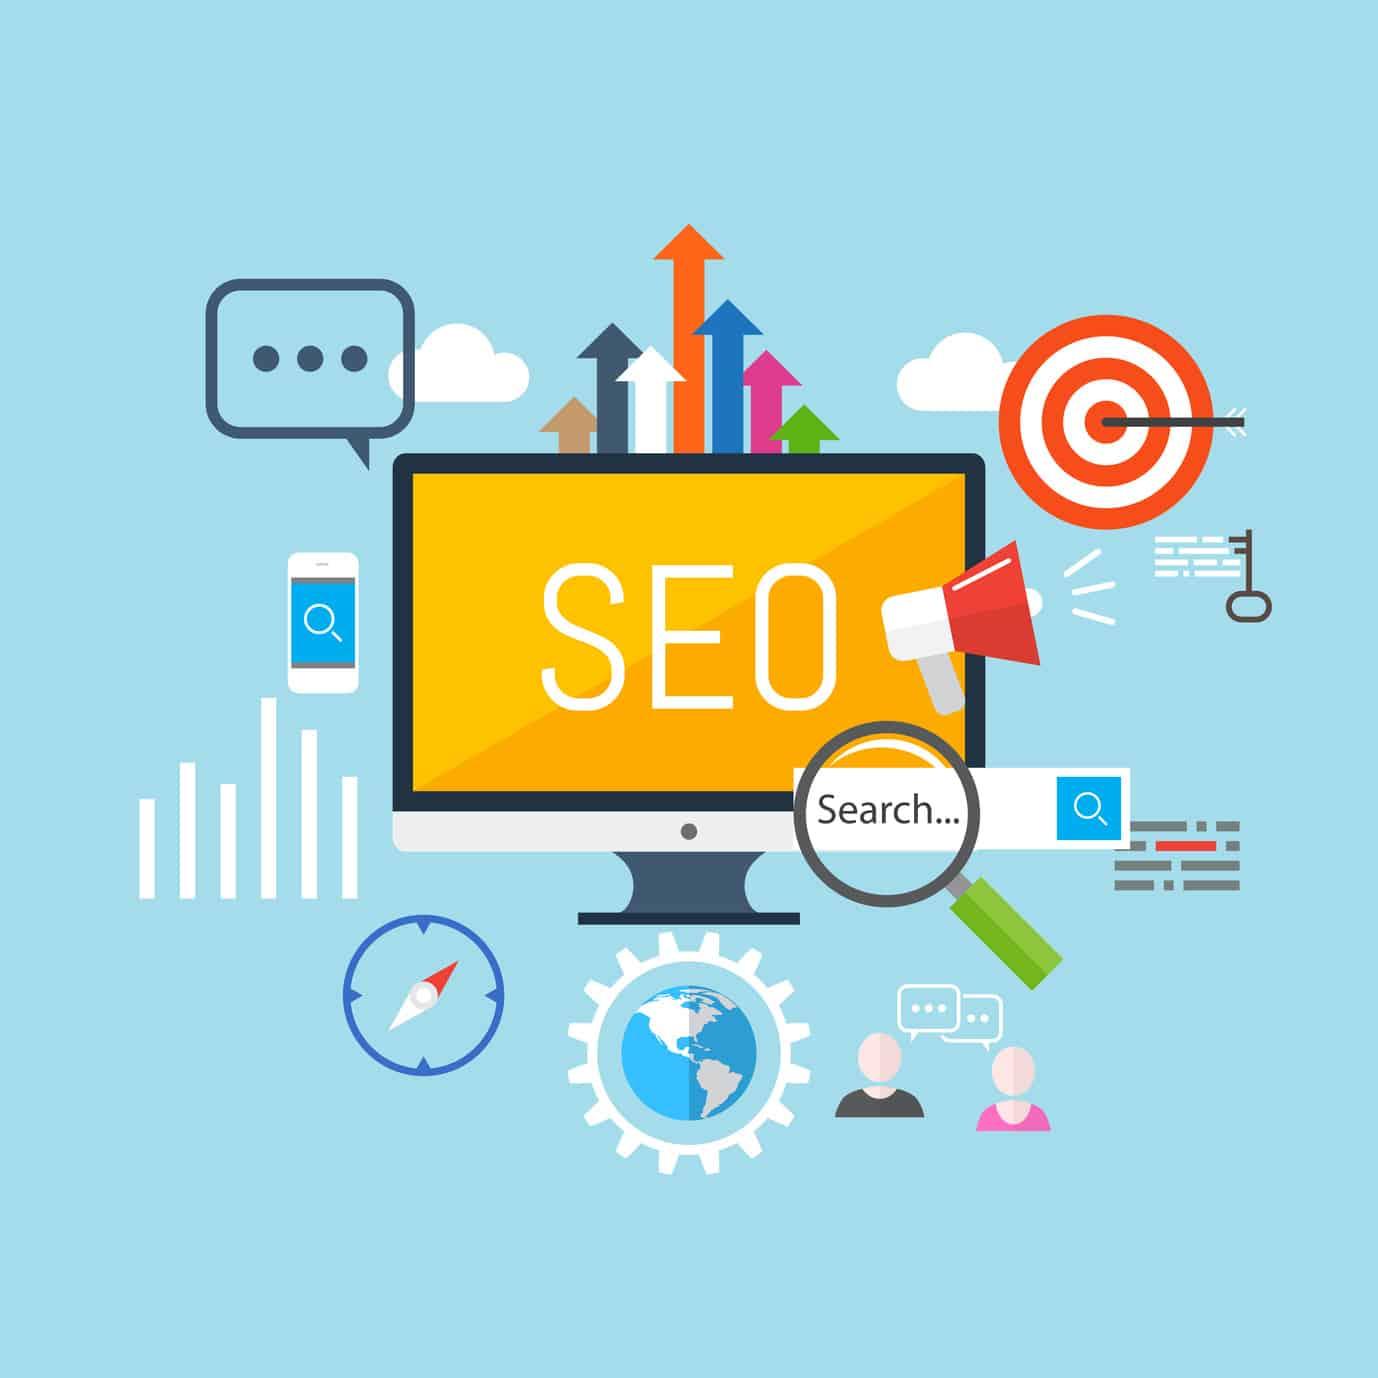 5 Guaranteed SEO Tips To Improve Your Website - - Linkis.com